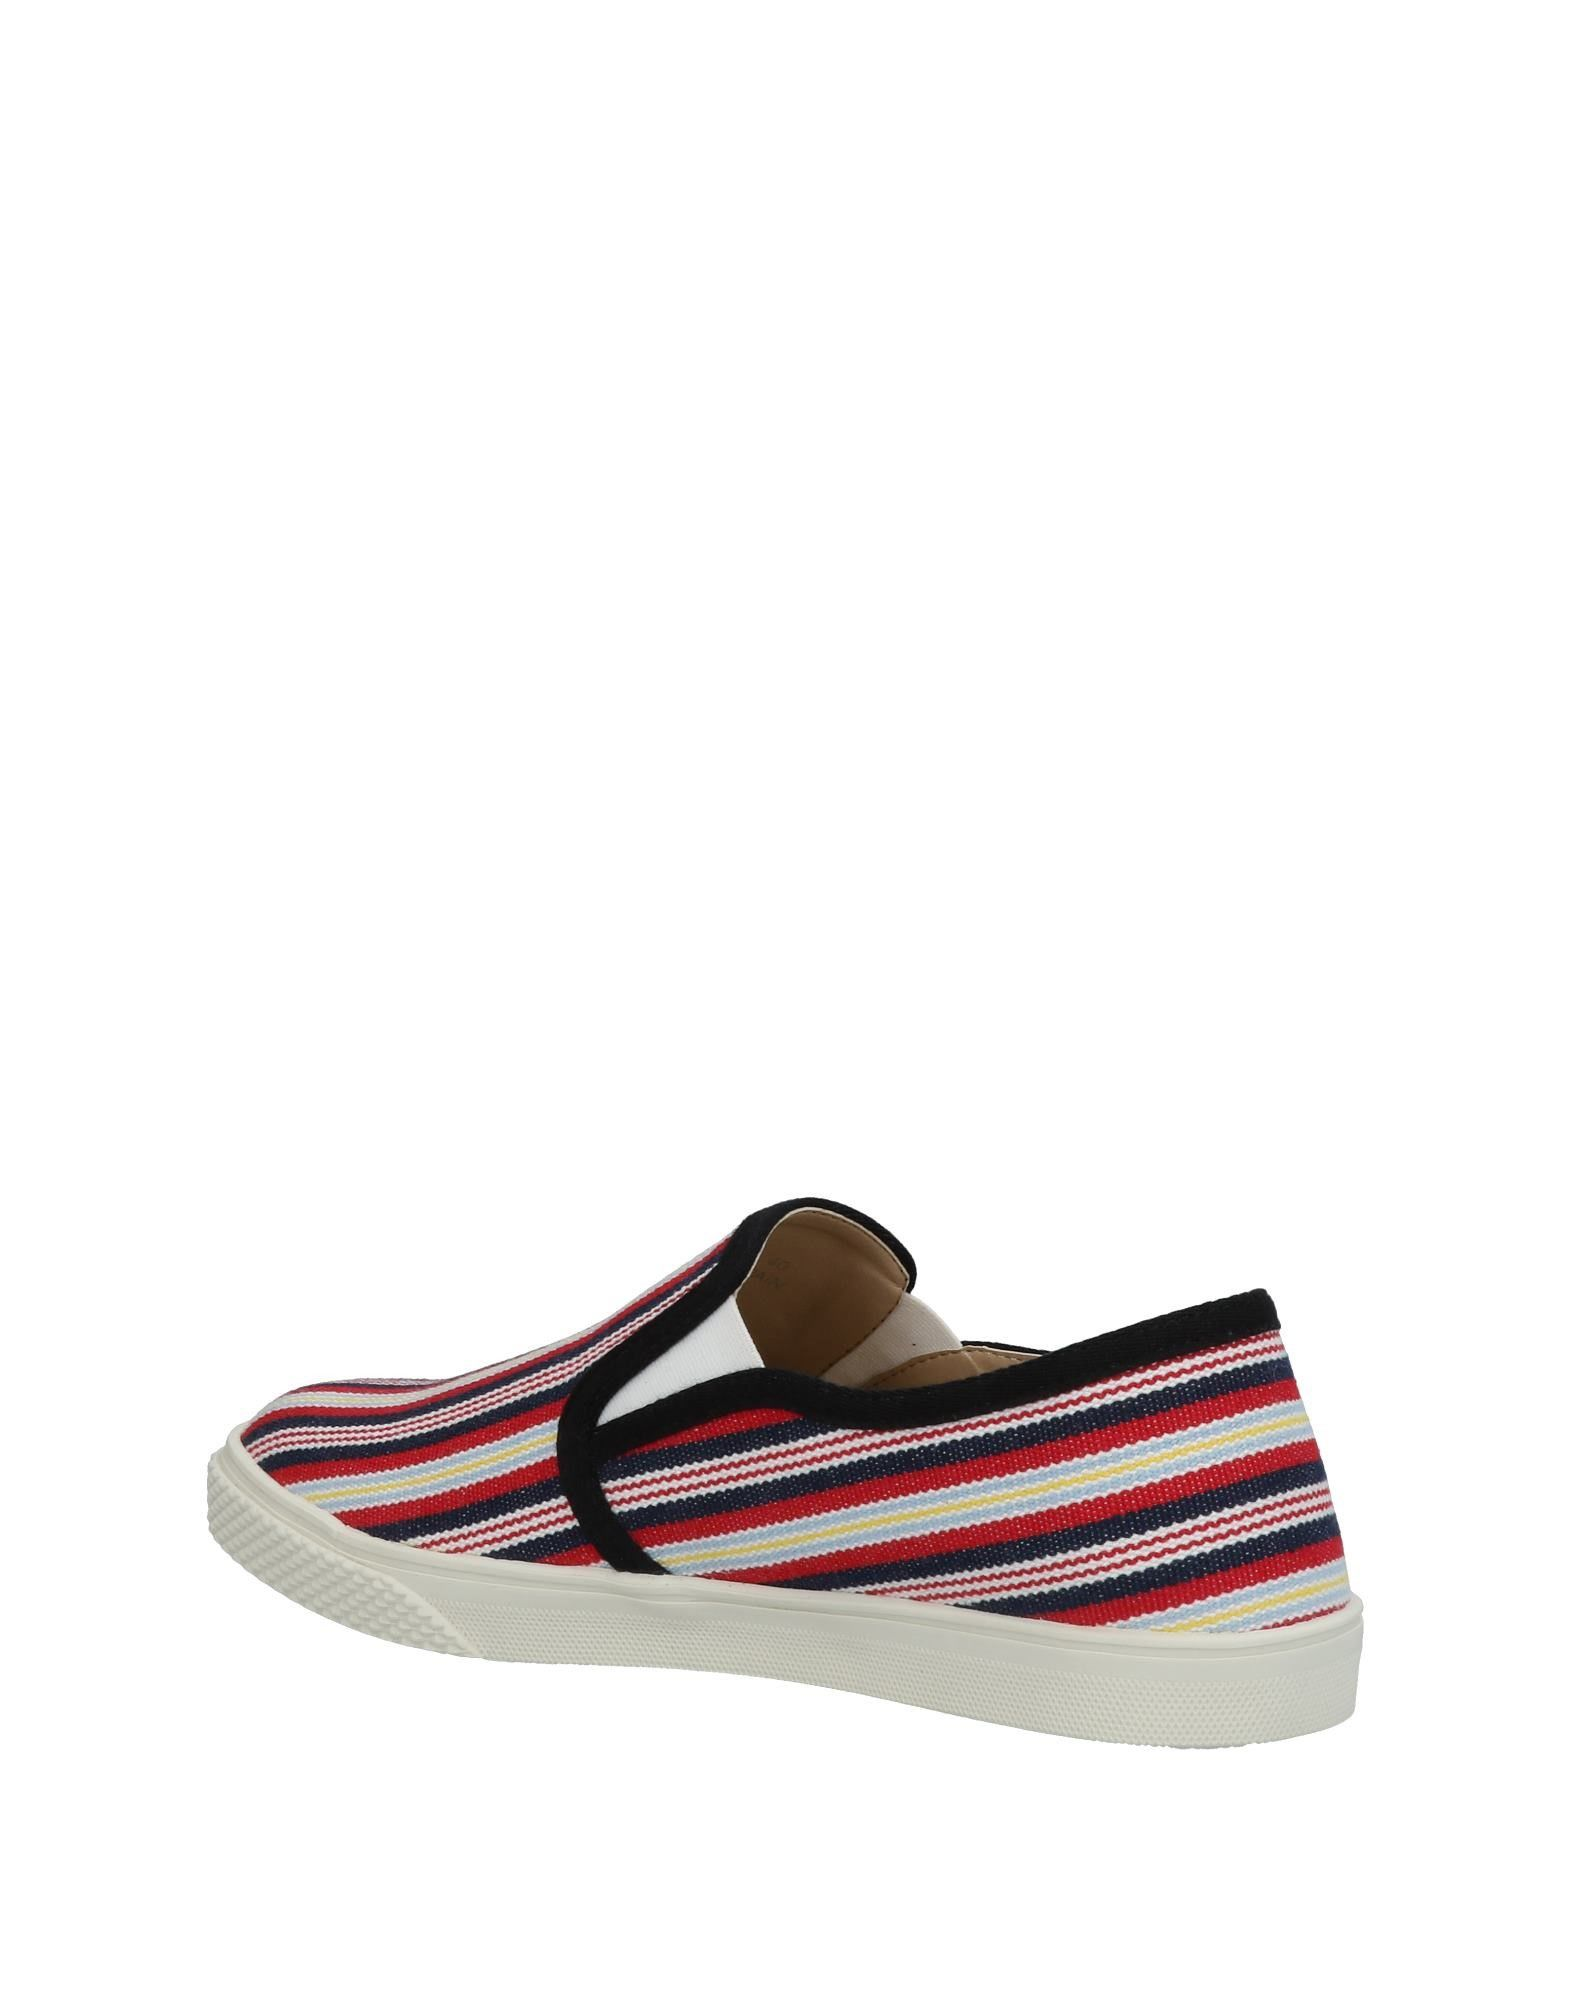 Stella Mccartney Sneakers Herren  11422525MW 11422525MW  fe27d7